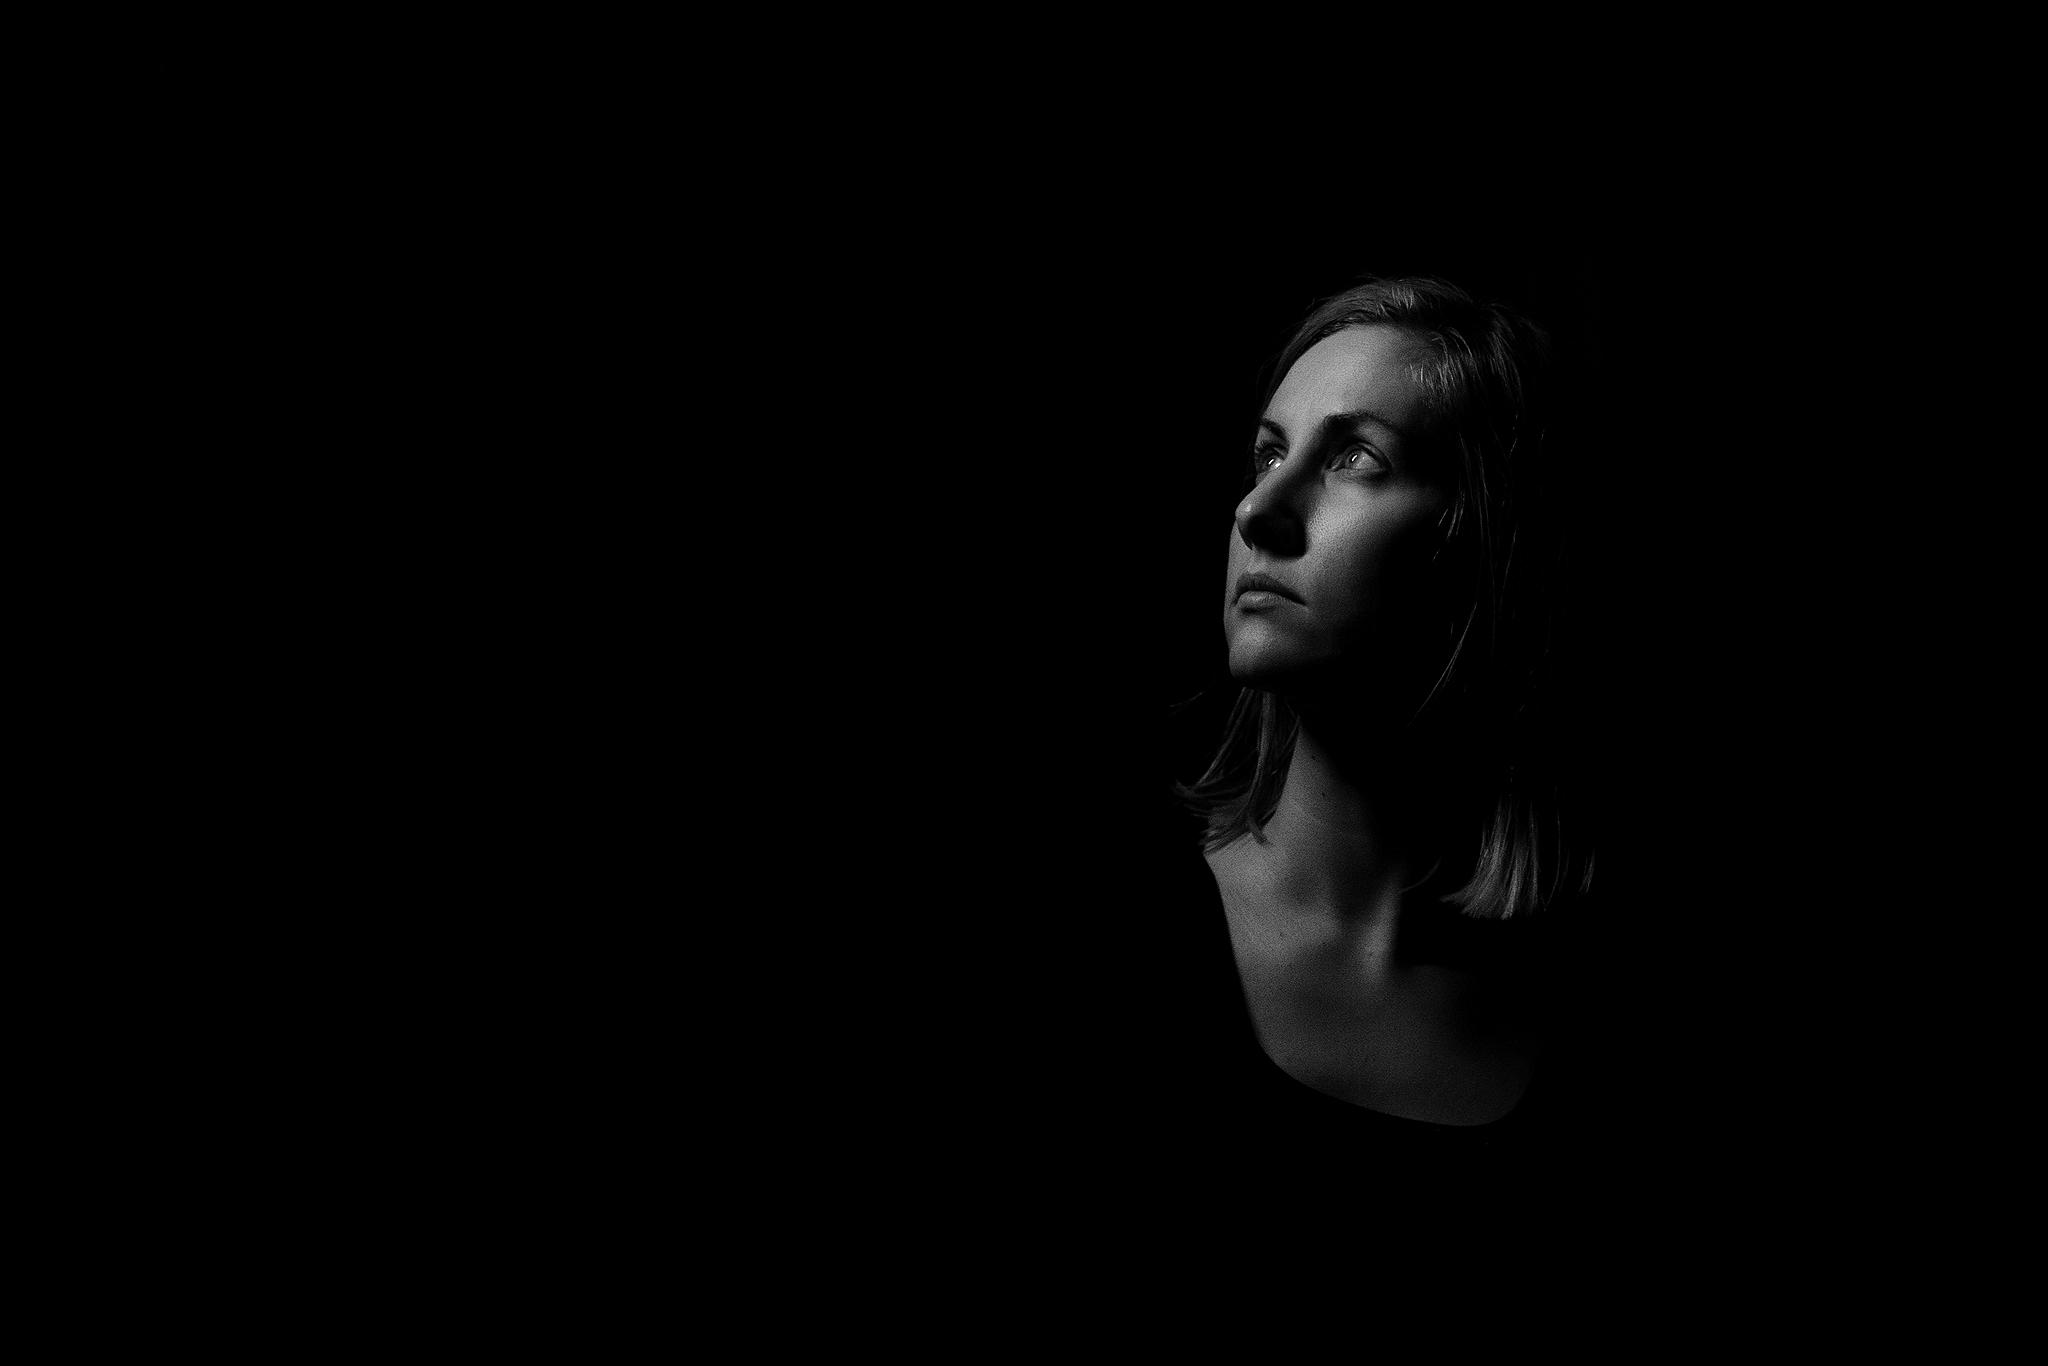 Monochromatic Self portrait Kristina Dominianni Middle Island Photographer